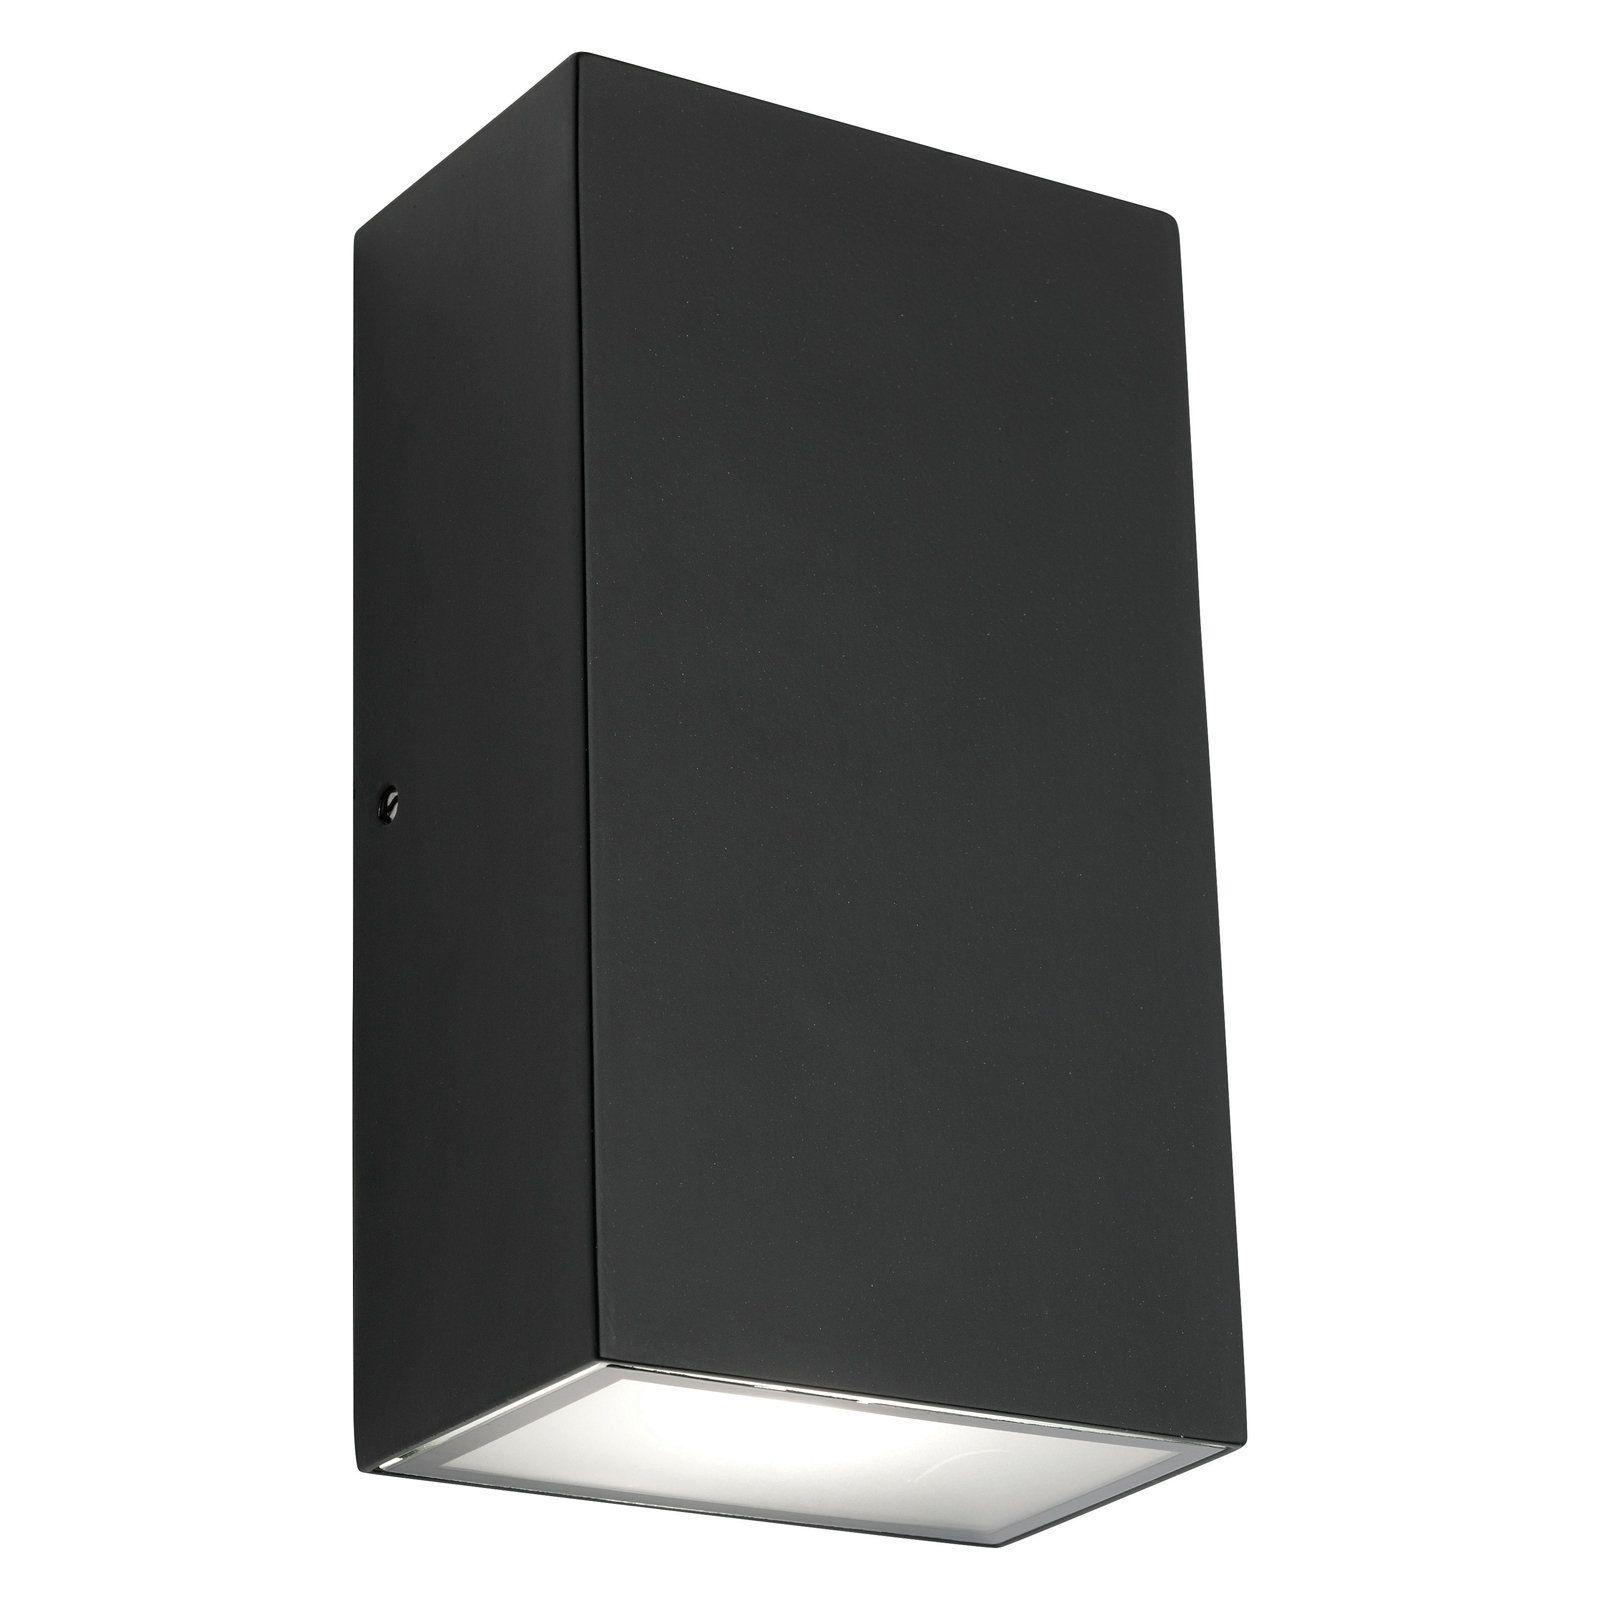 Exterior Garage Downlights: Mercator Brenton LED Square Black Up/Down Exterior Wall